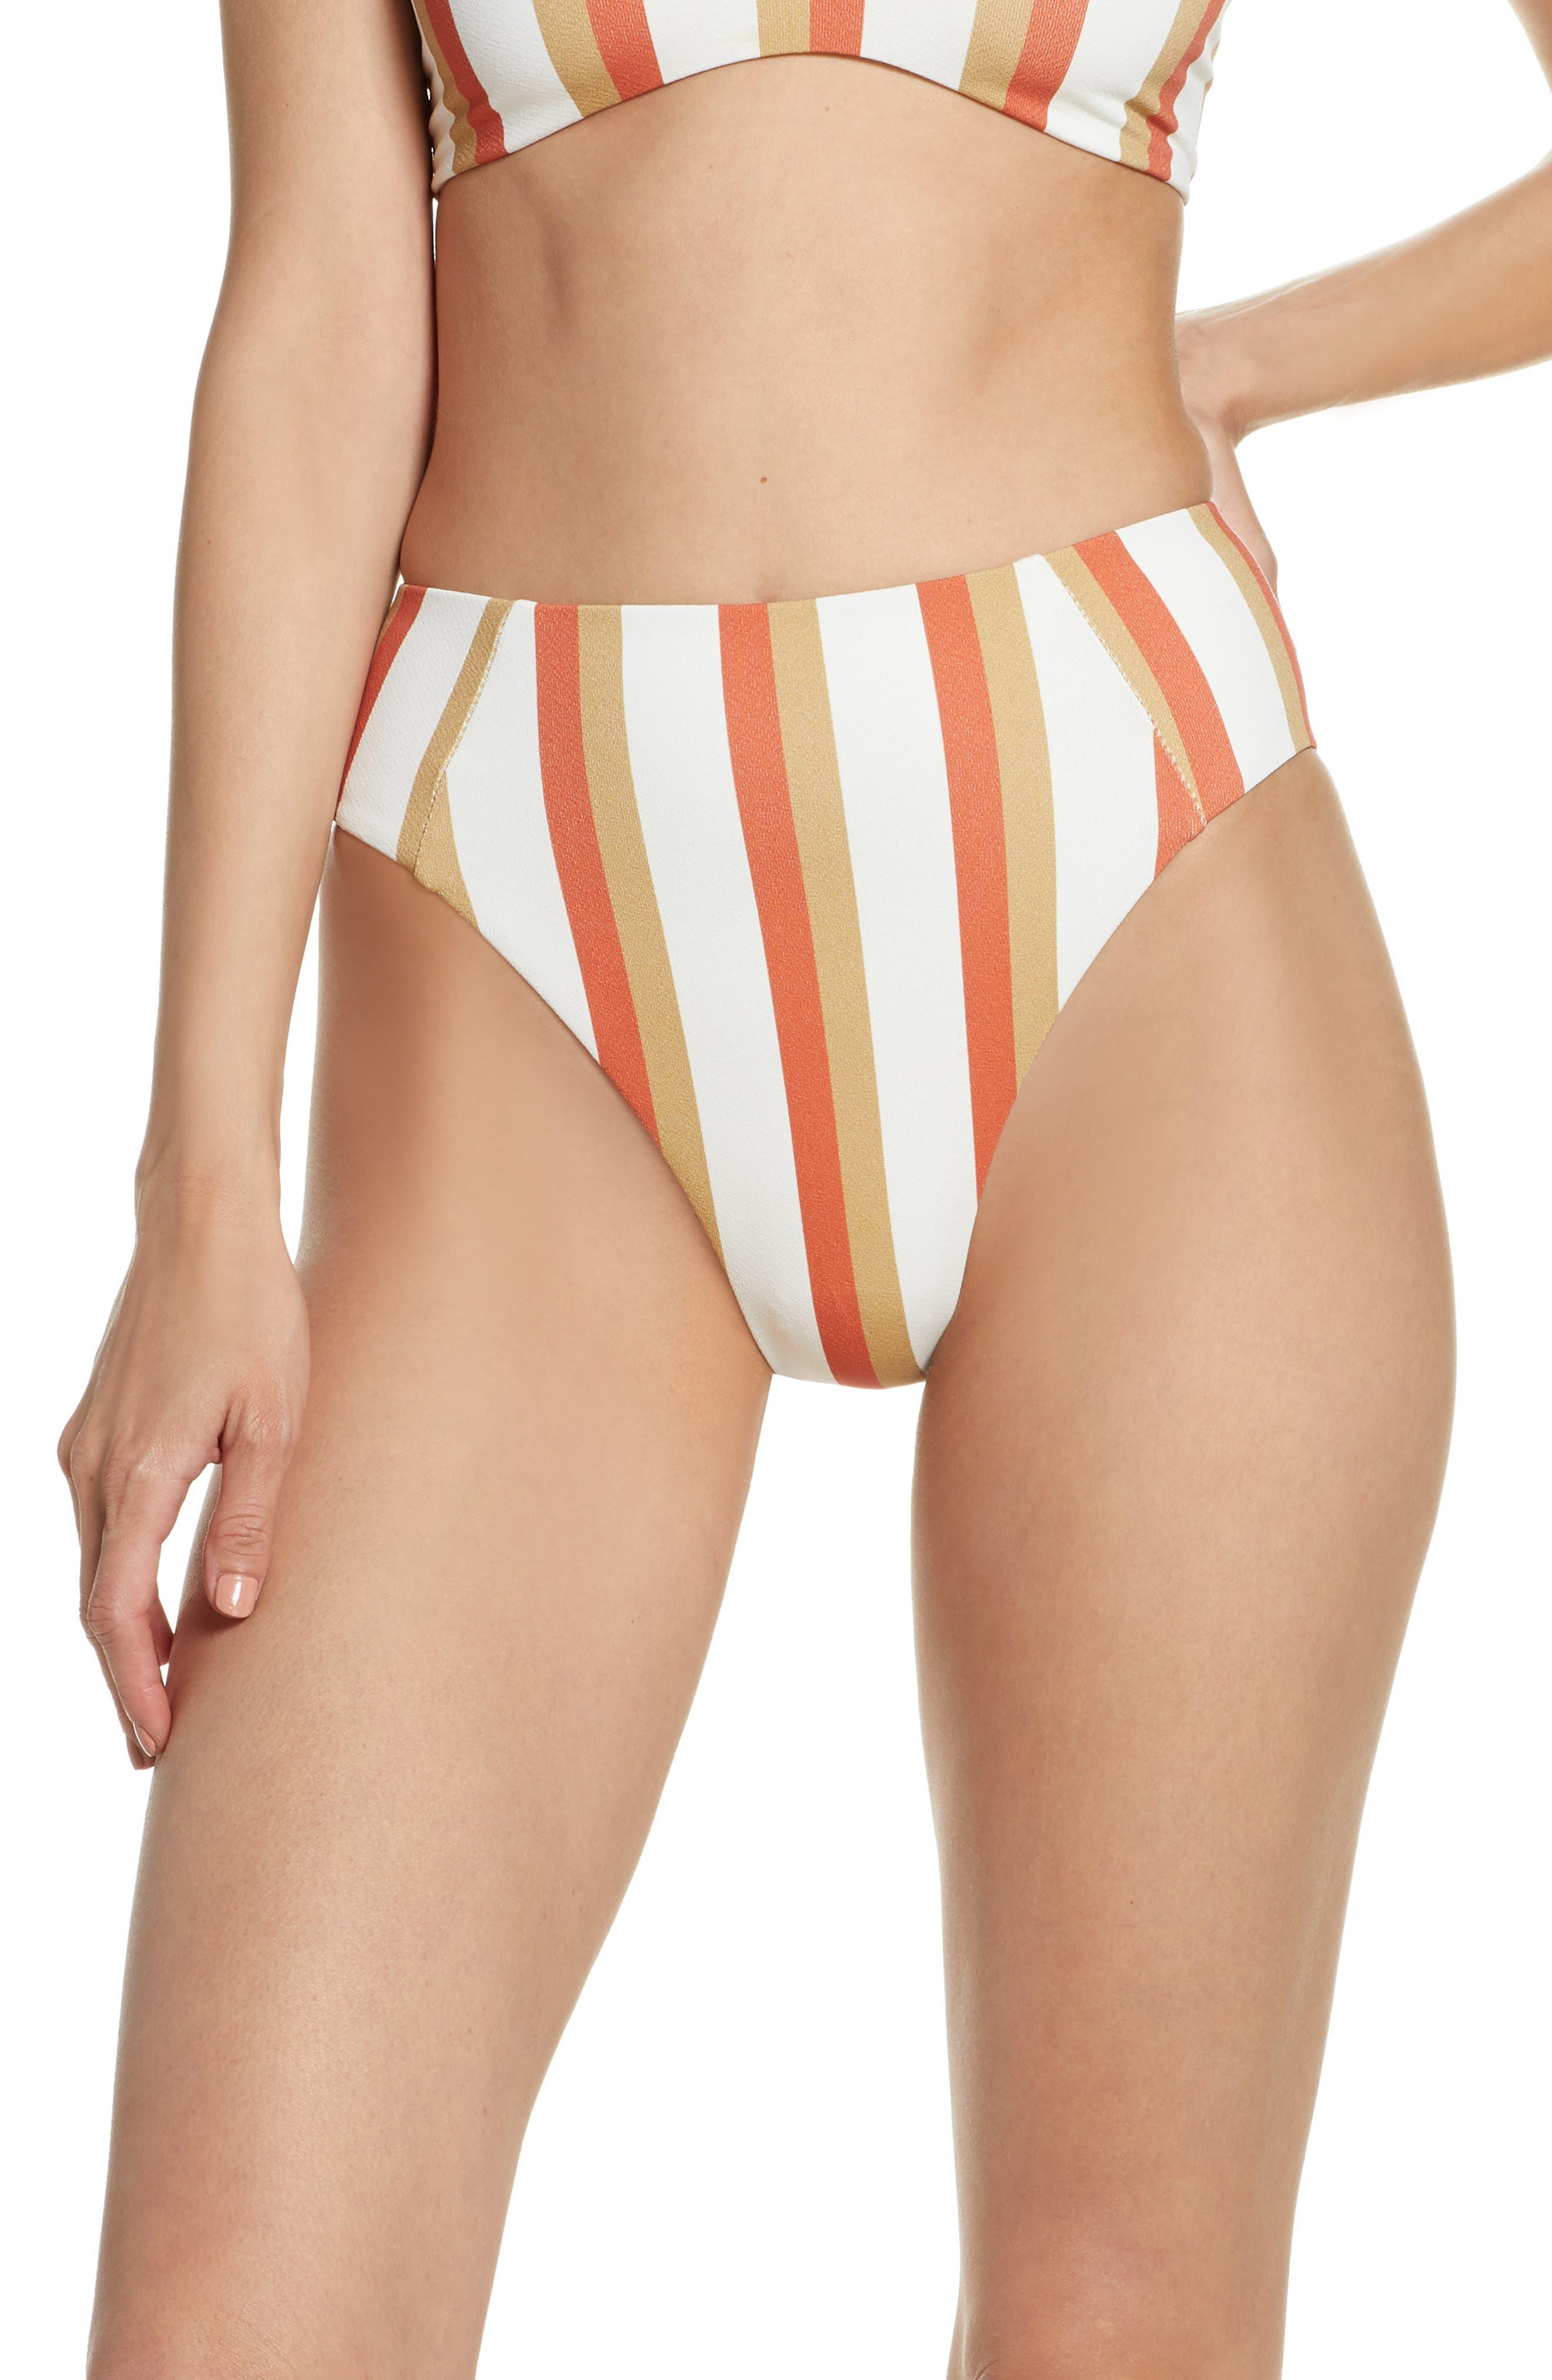 Boys + Arrows Stanlee High Waist Bikini Bottoms, Orange